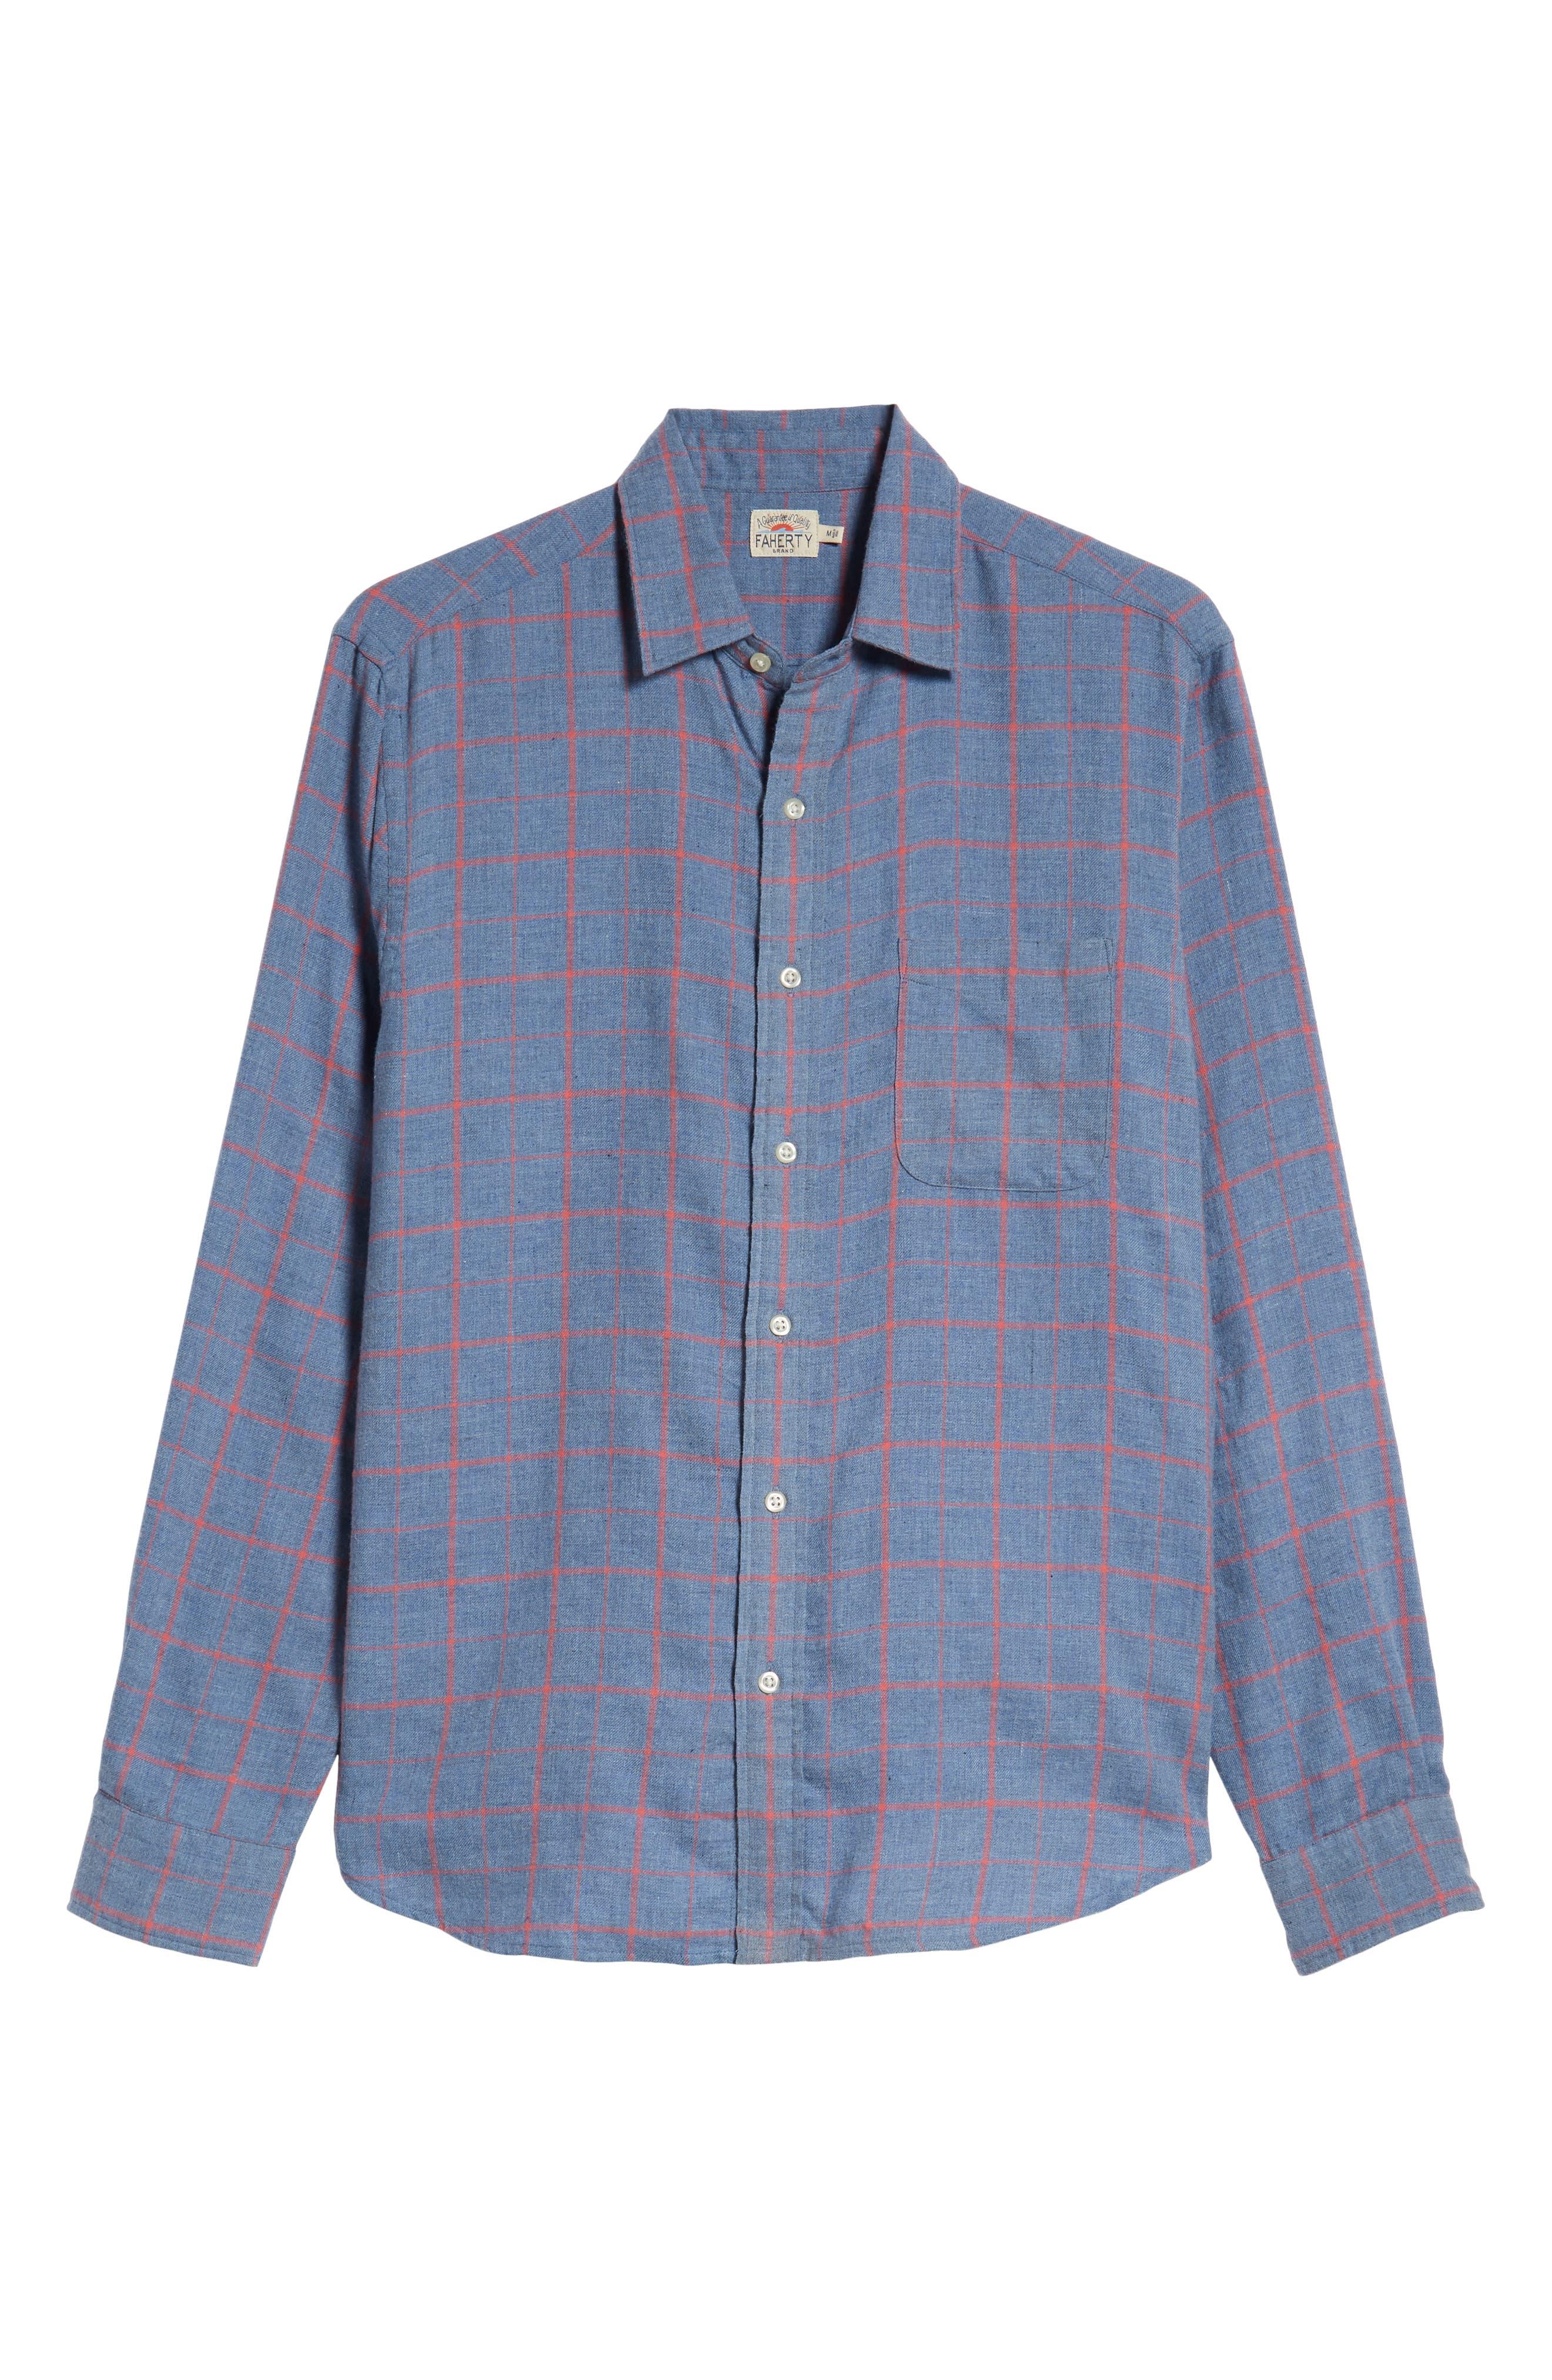 Ventura Windowpane Sport Shirt,                             Alternate thumbnail 5, color,                             BLUE MELANGE WINDOWPANE